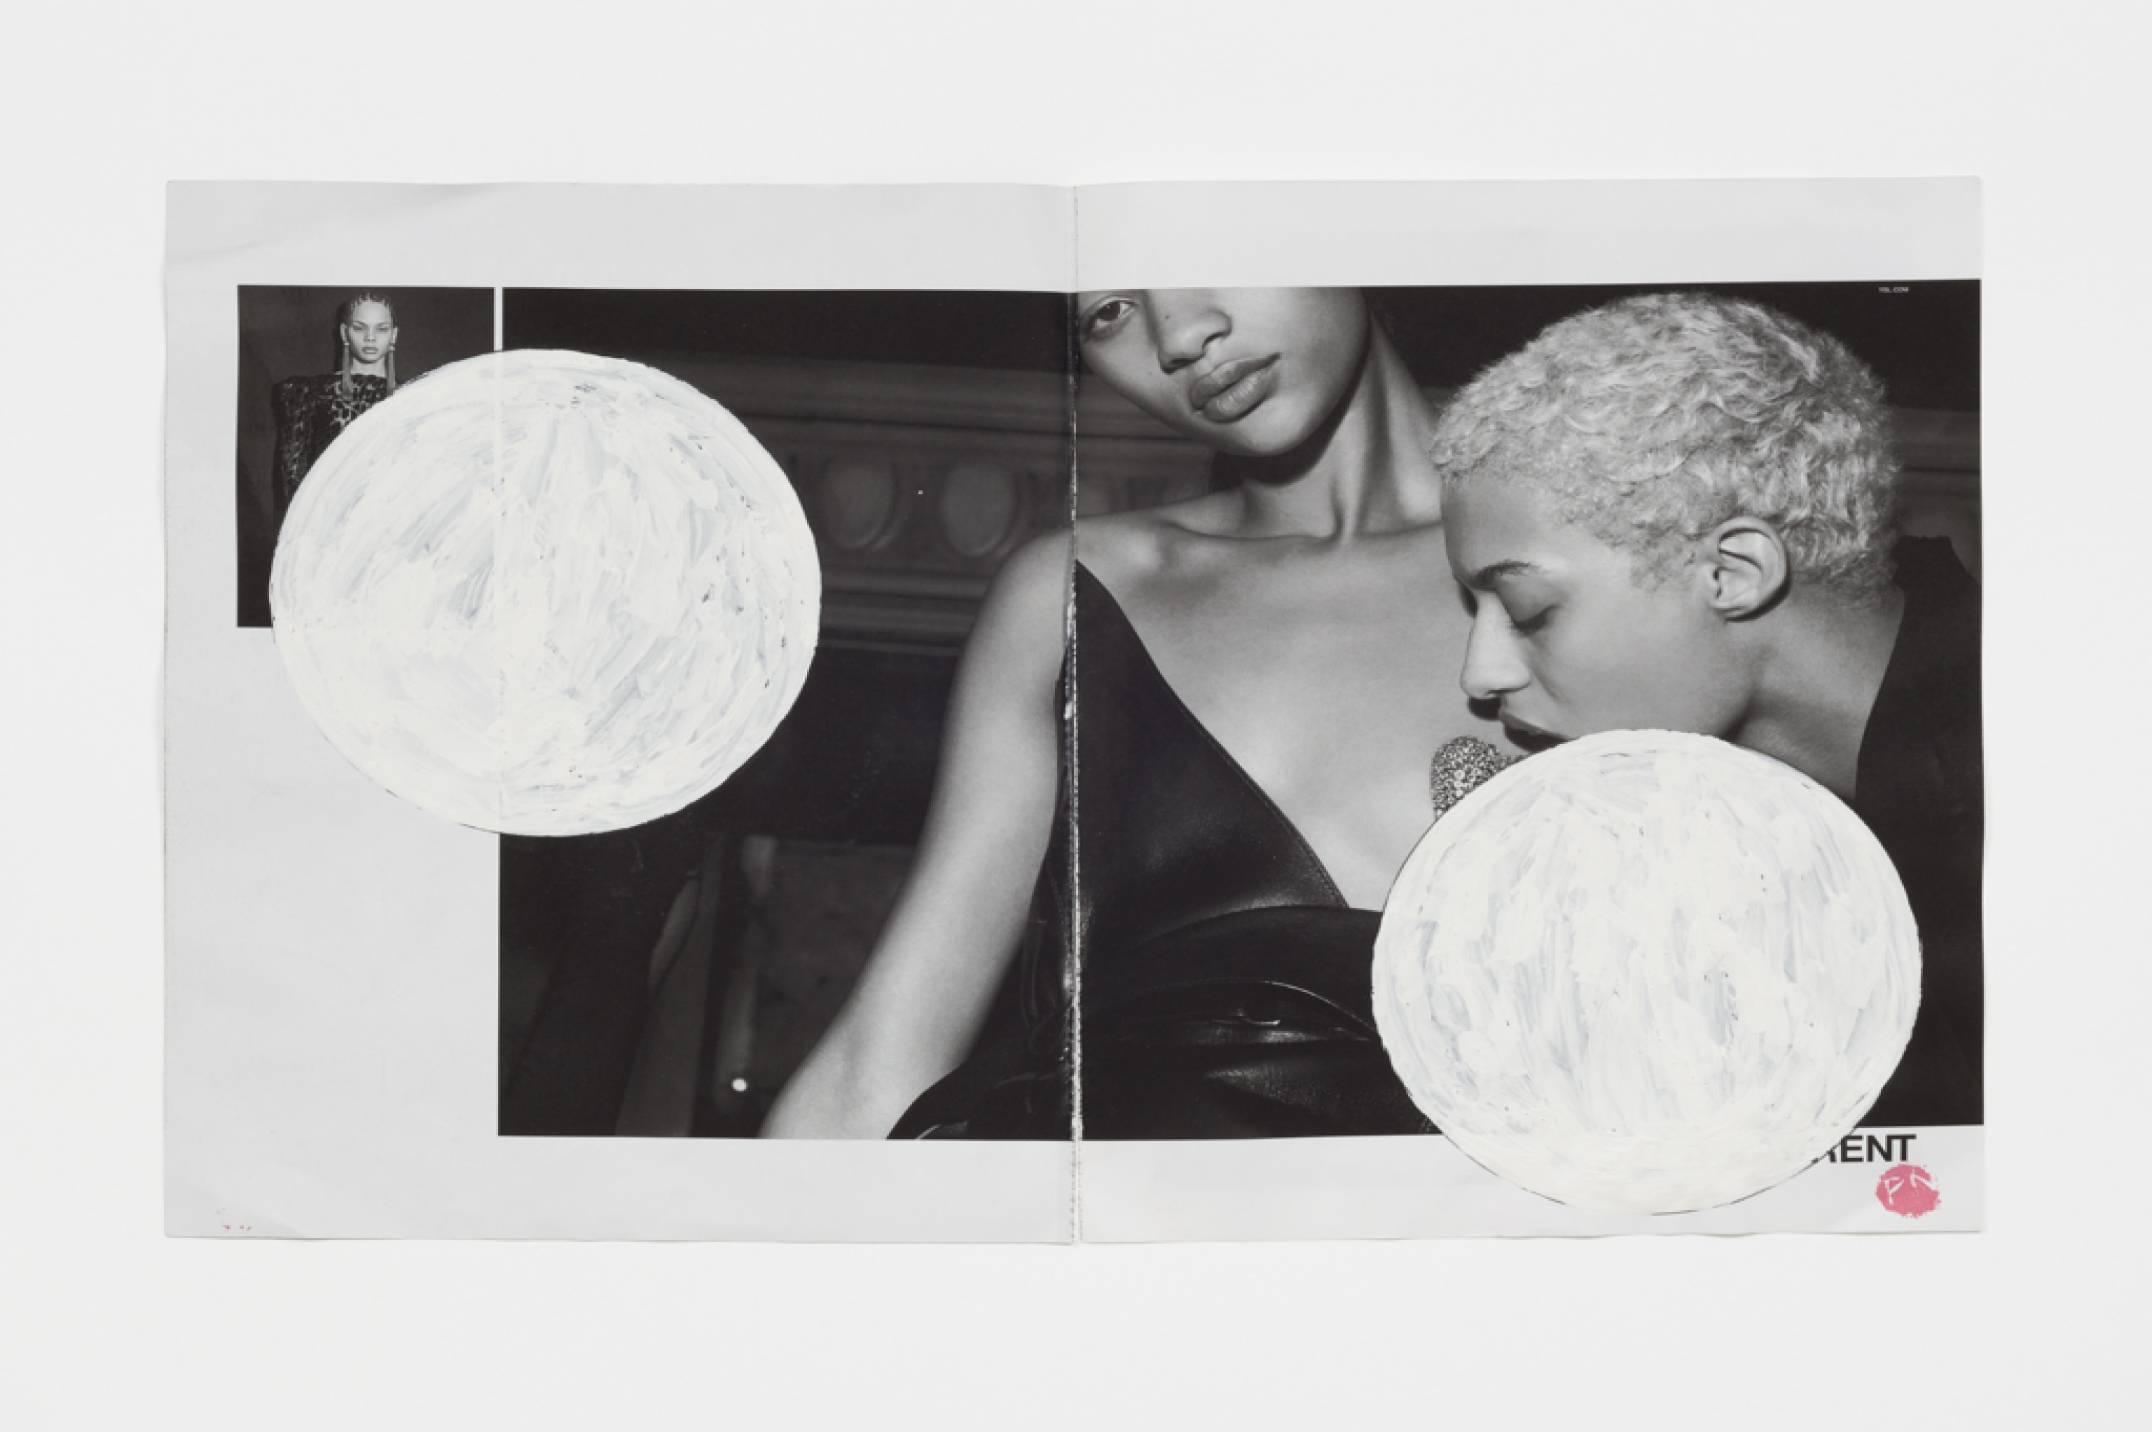 Paulo Monteiro,&nbsp;<em>ENT,</em> 2017, 'Wite.Out' (quick dry correction fluid) on magazine print, 46 × 30 cm - Mendes Wood DM